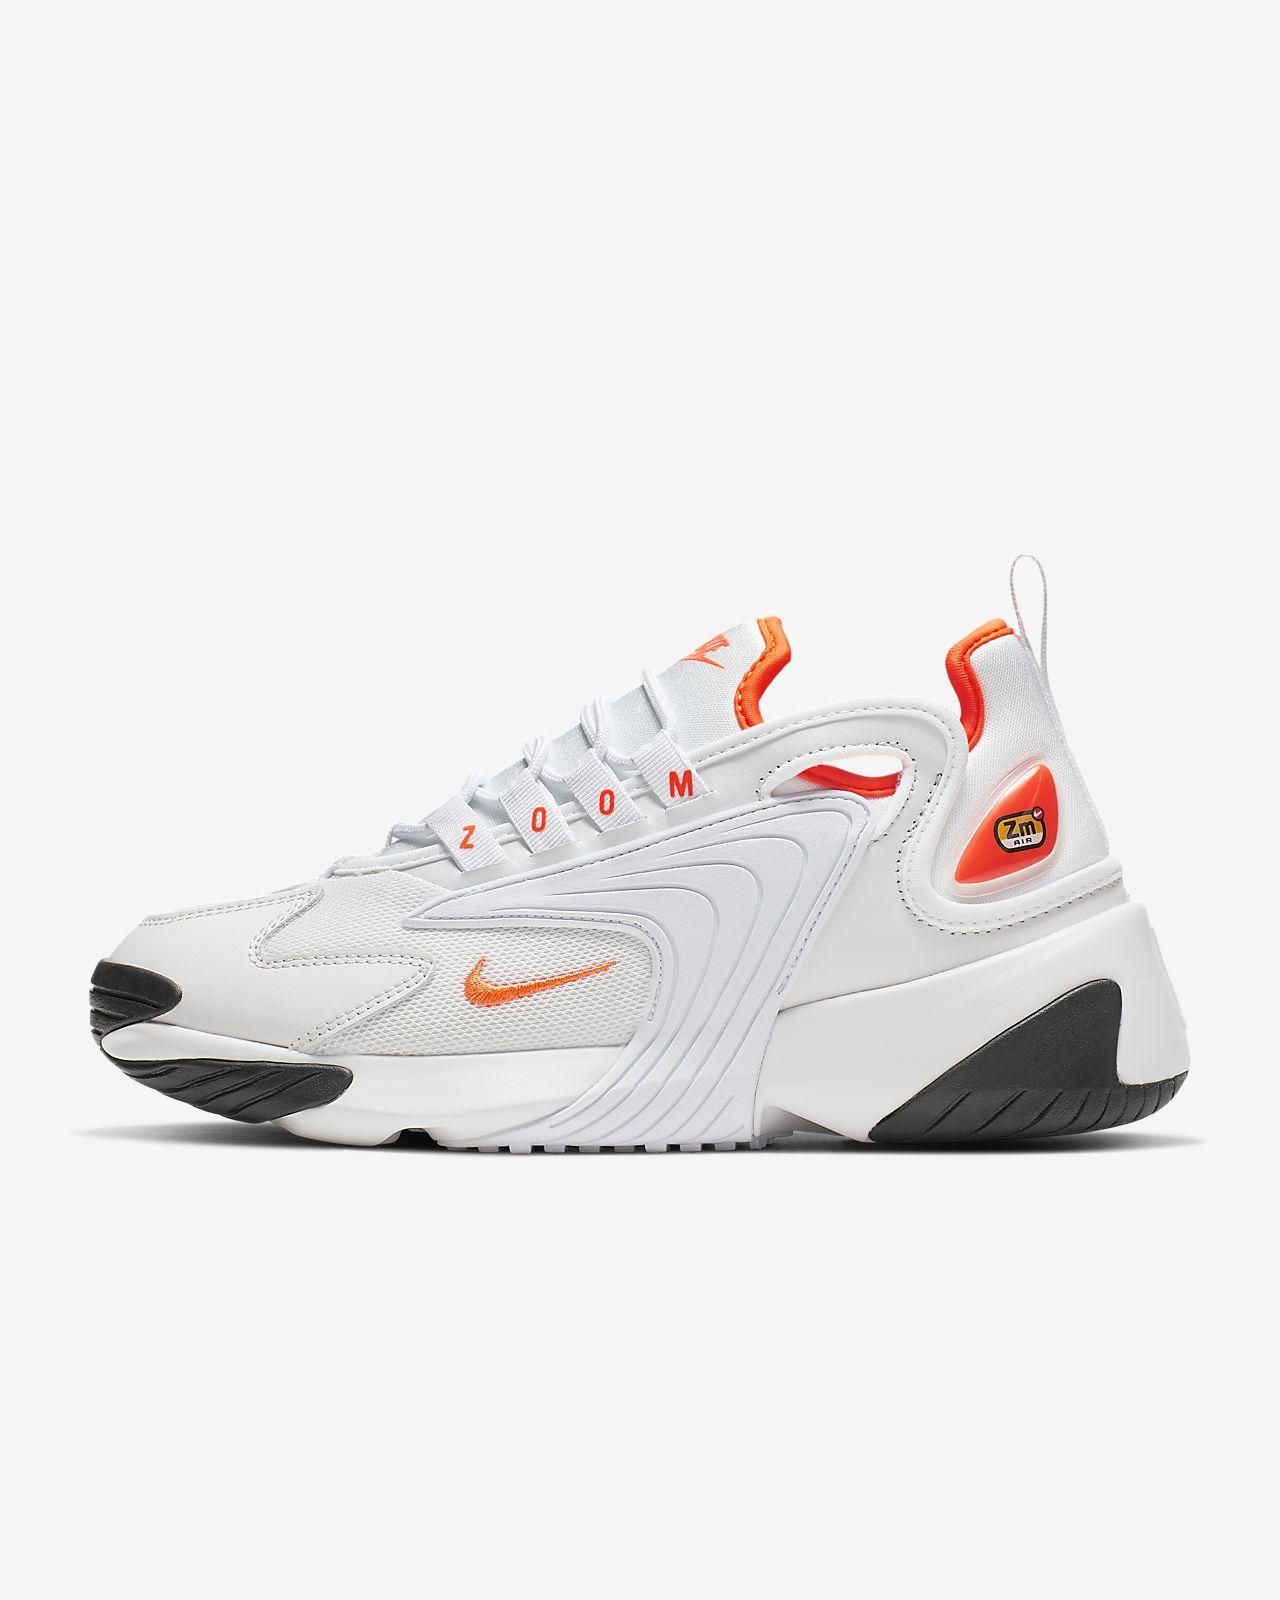 a87502679a3 Nike Zoom 2K Zapatillas - Mujer. Nike.com ES